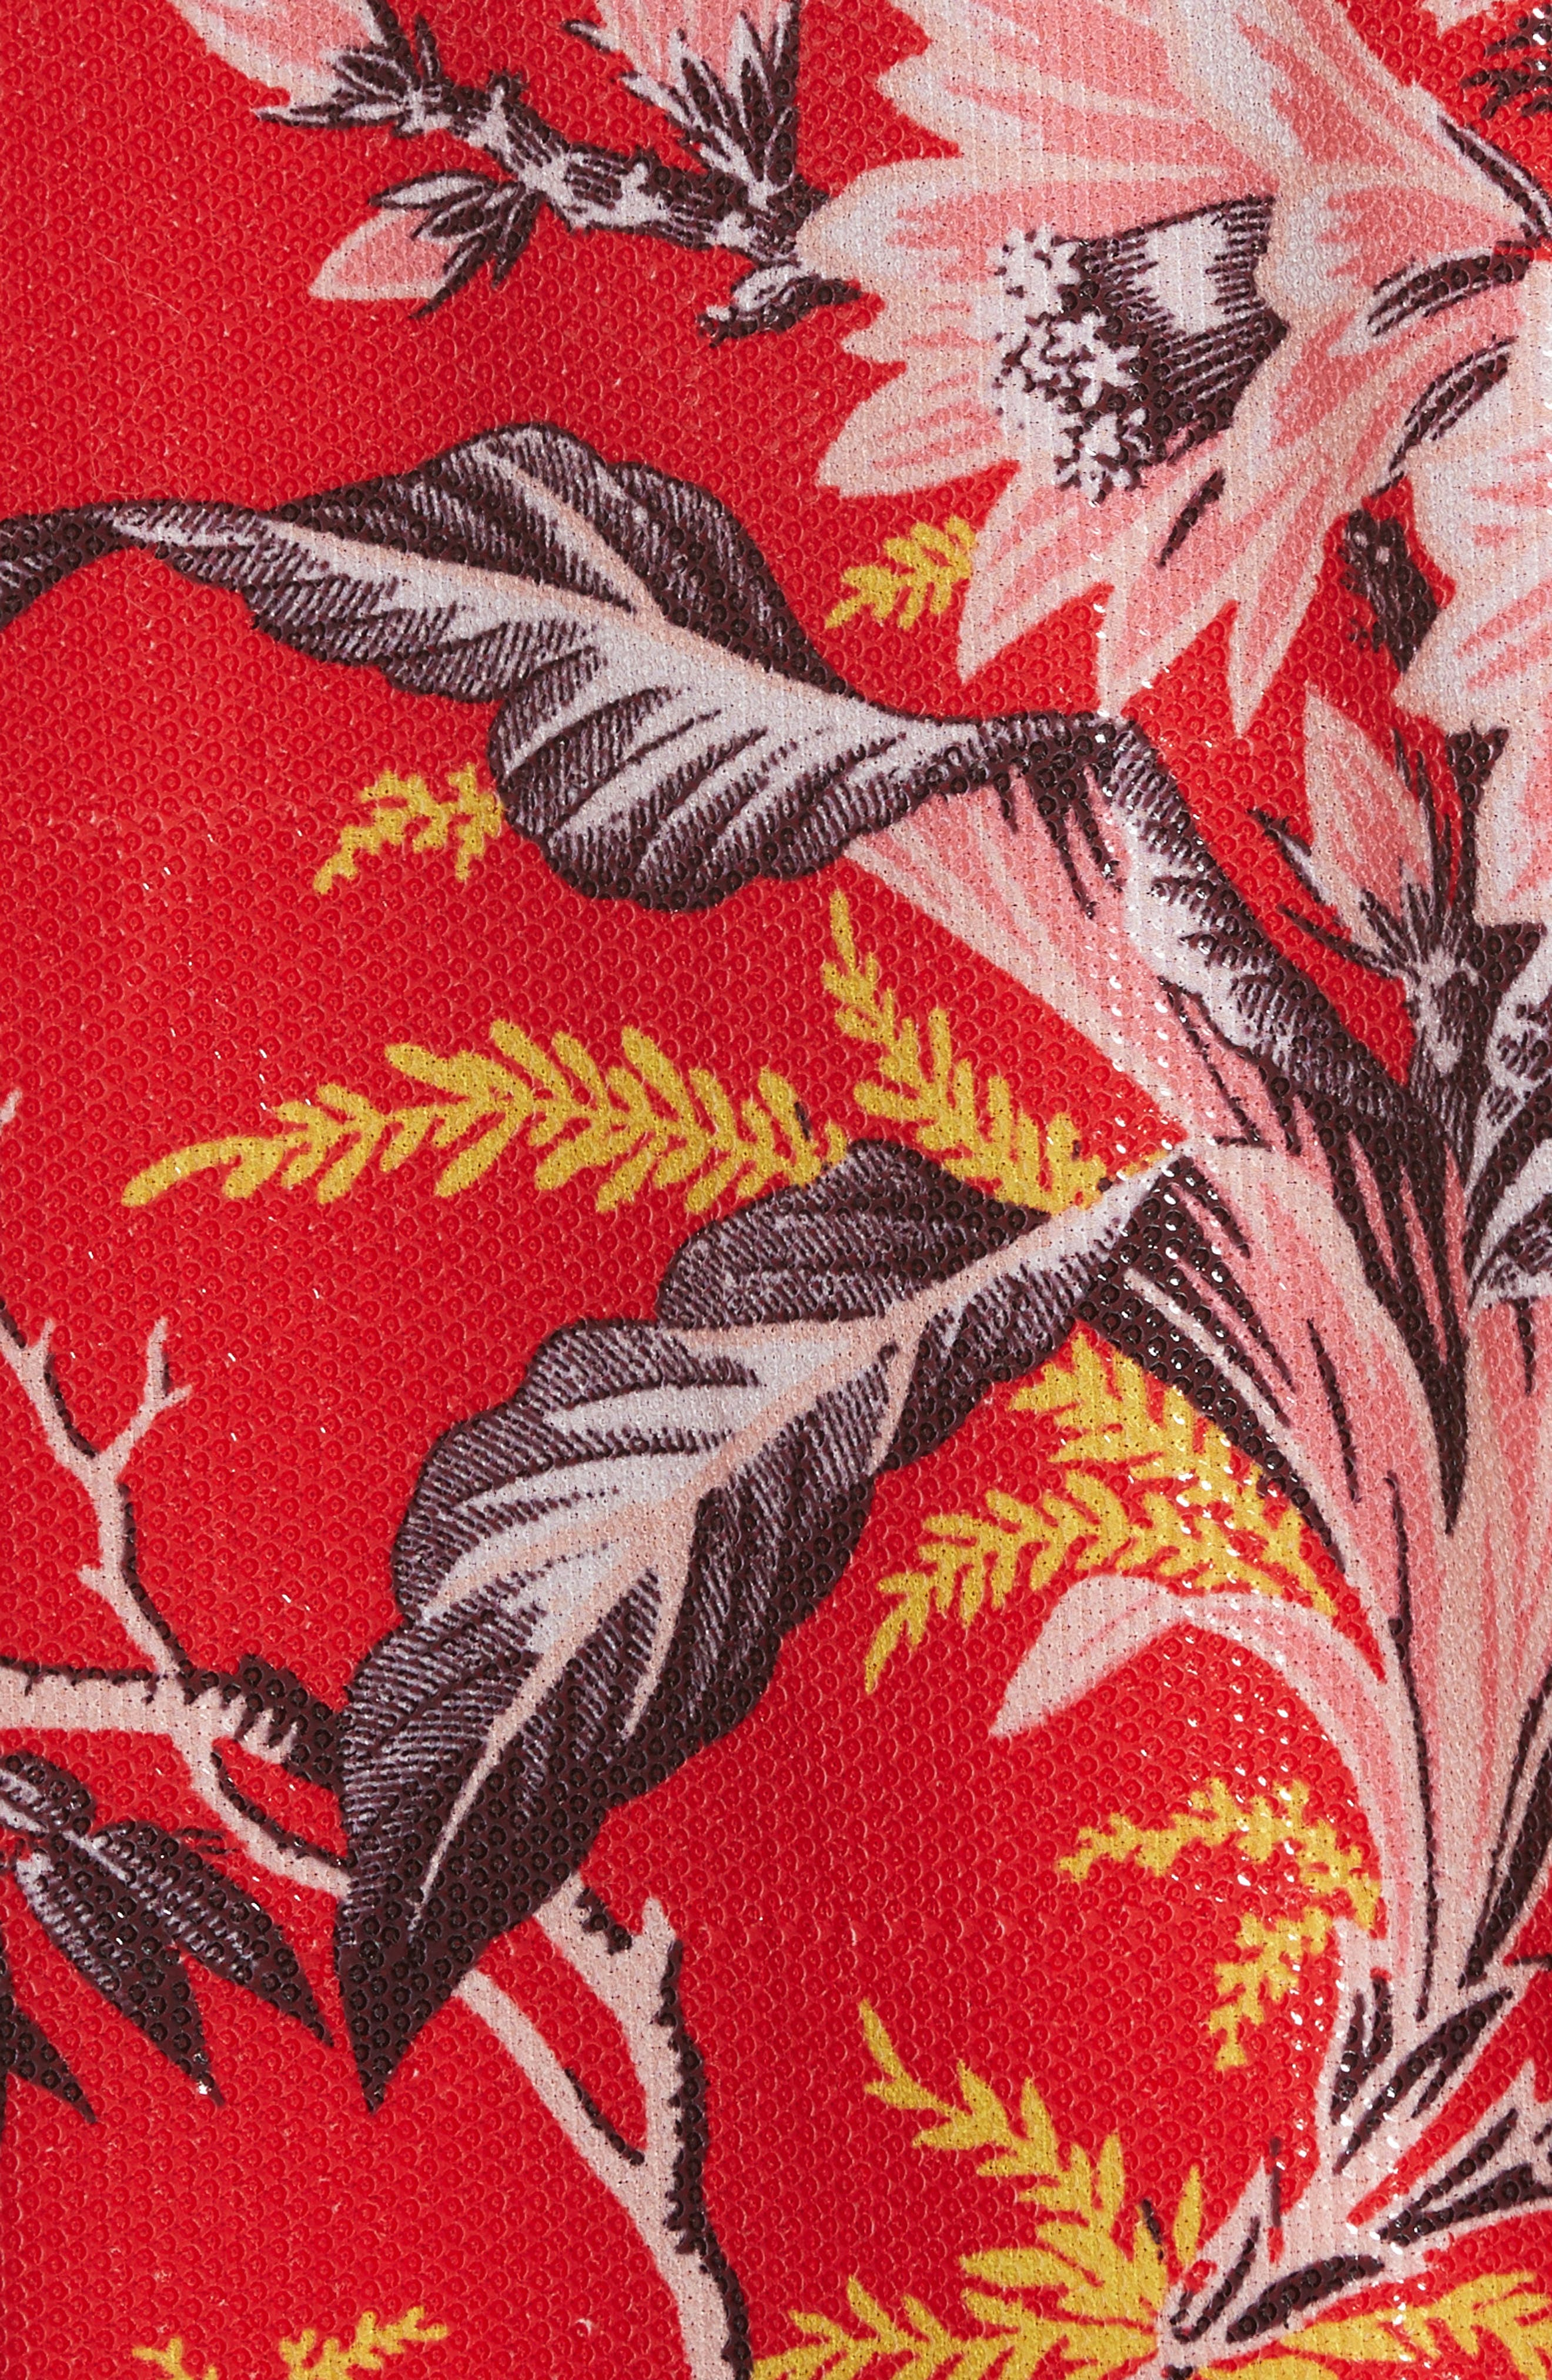 Diane von Furstenberg Fluid Sequin Minidress,                             Alternate thumbnail 5, color,                             603